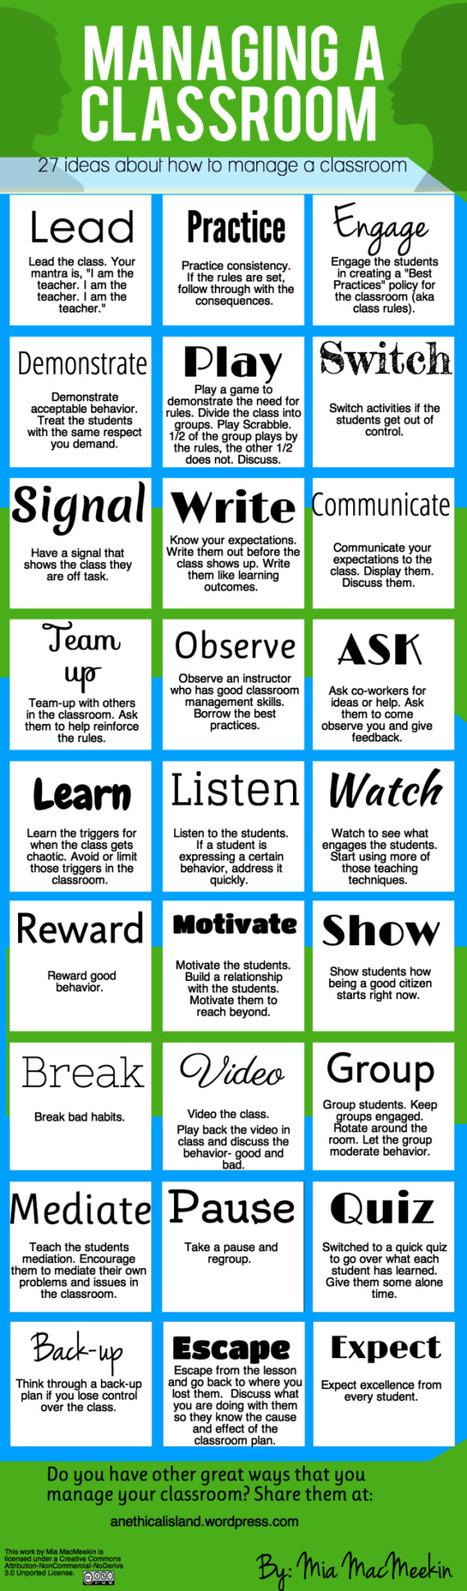 27 Tips For Effective Classroom Management - Edudemic   21st century skills   Scoop.it